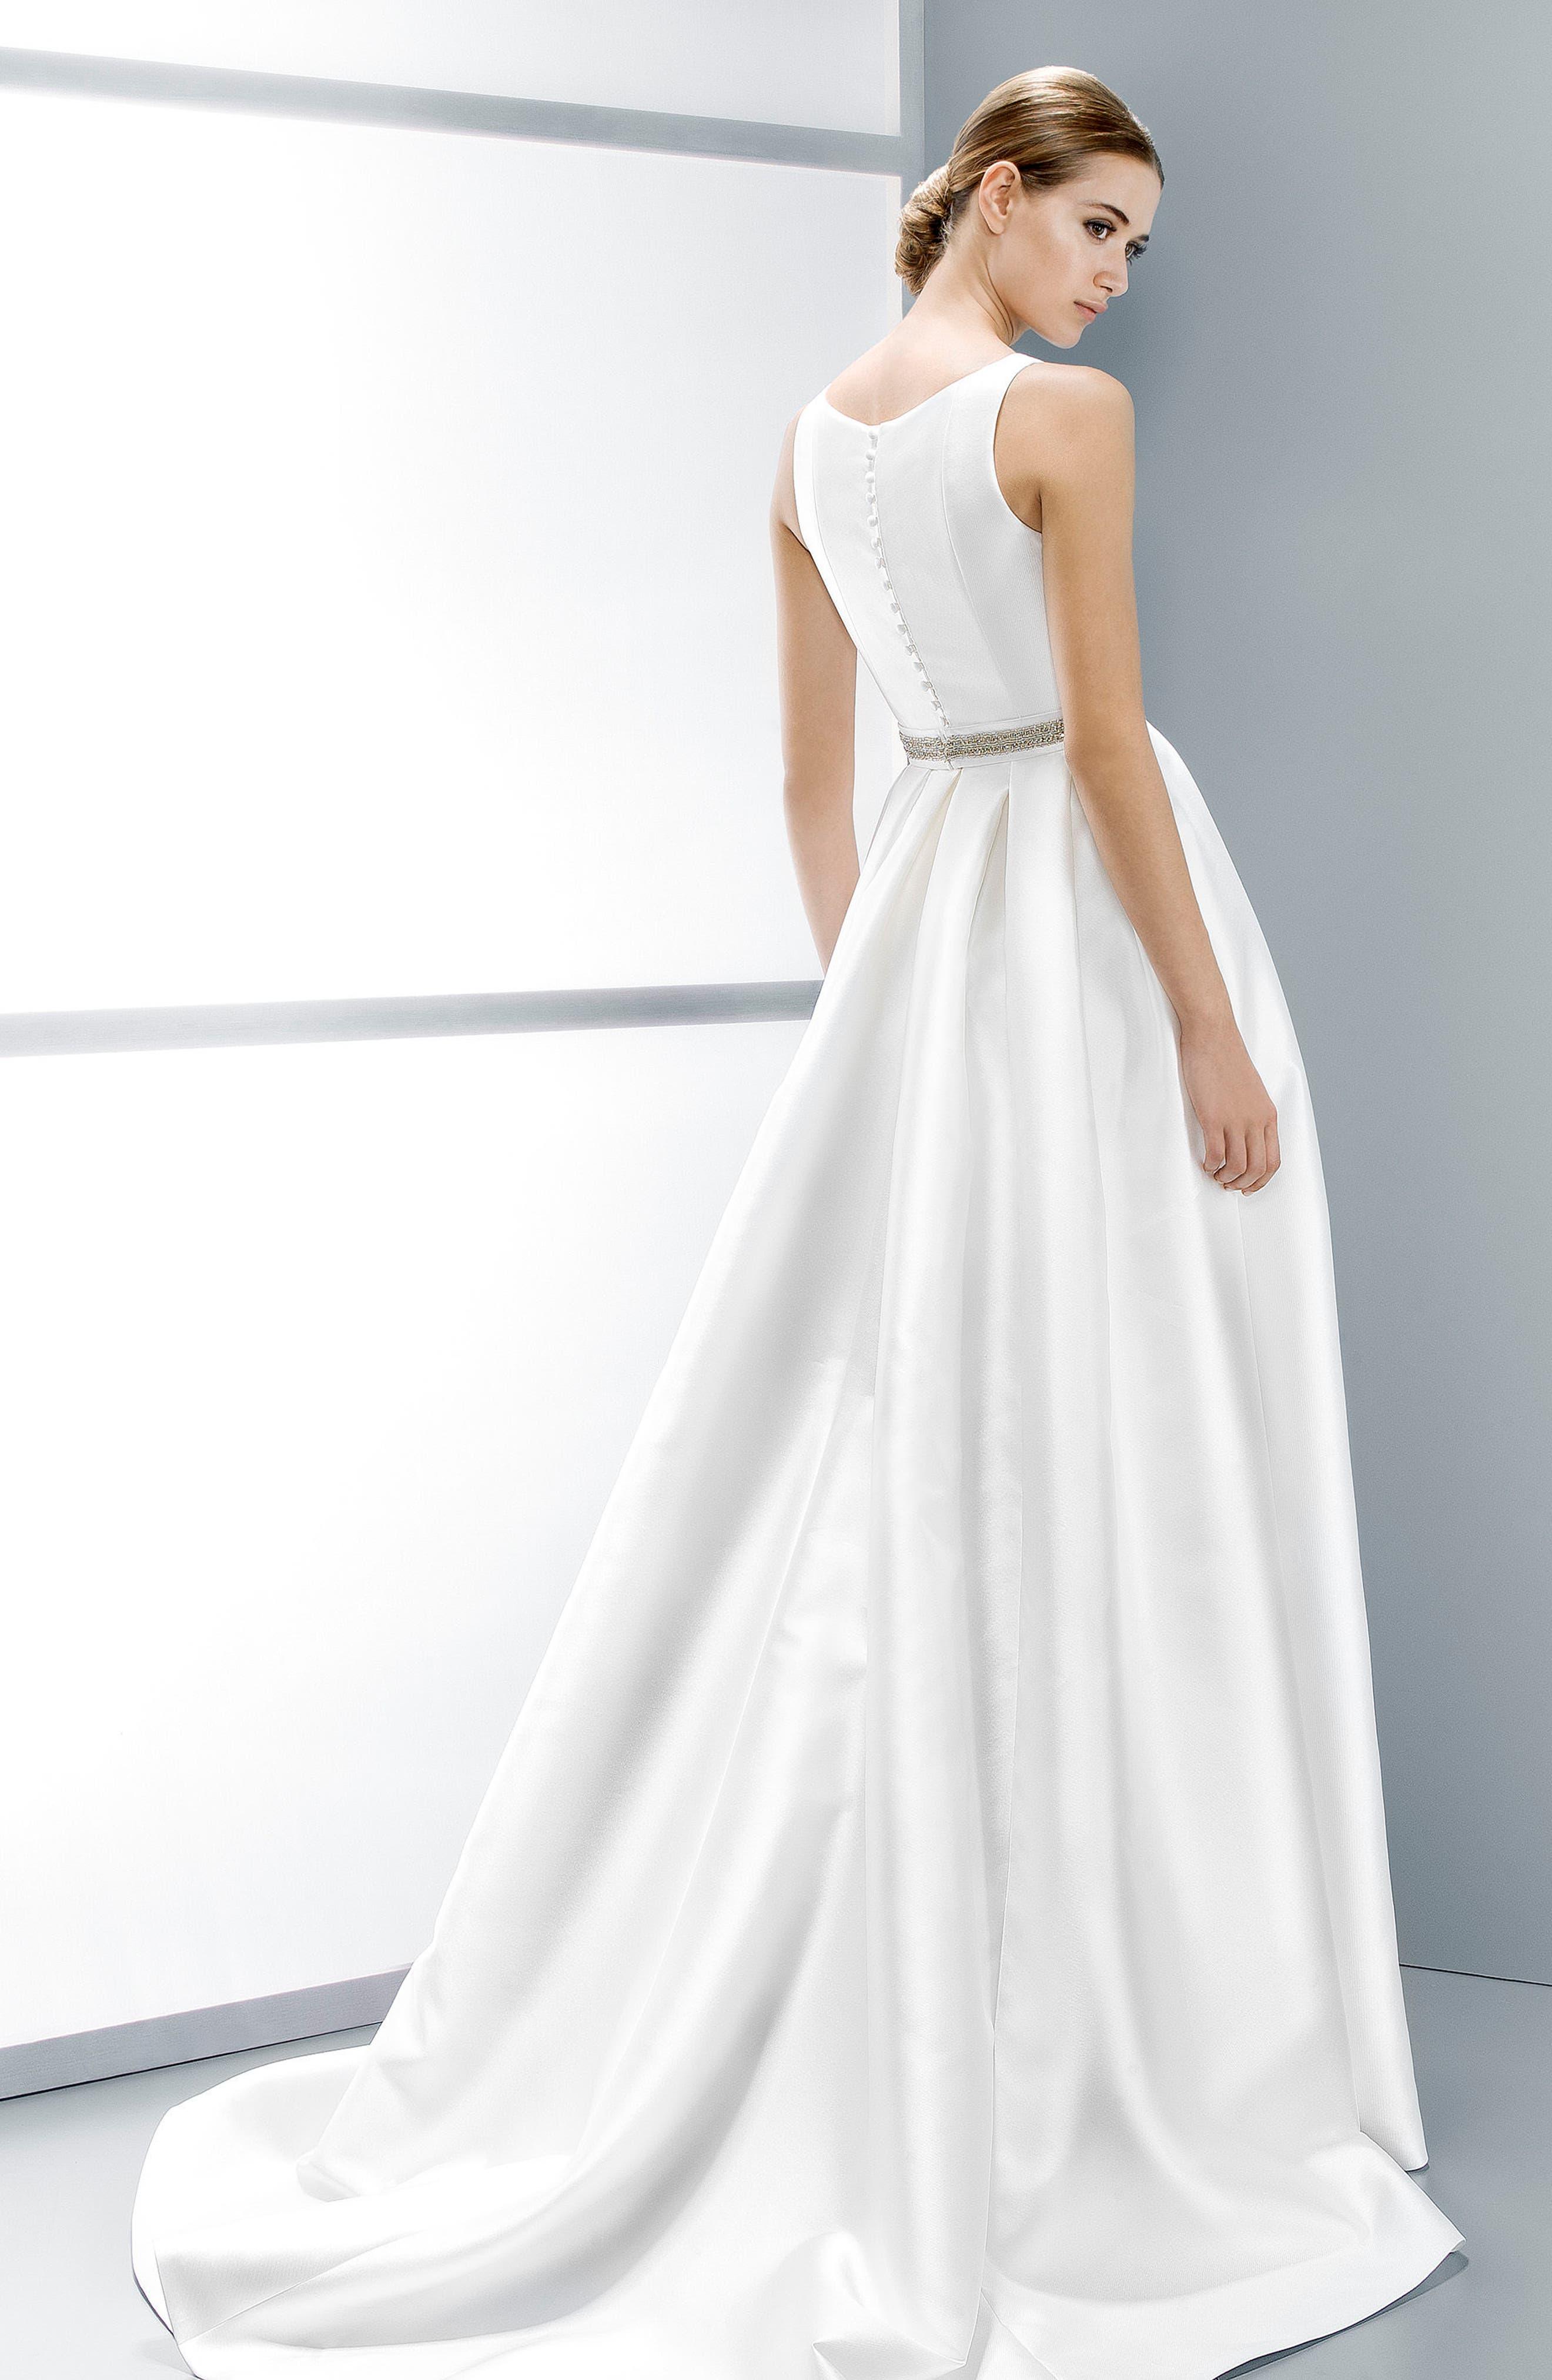 Embellished Waist Mikado A-Line Dress,                             Alternate thumbnail 7, color,                             IVORY